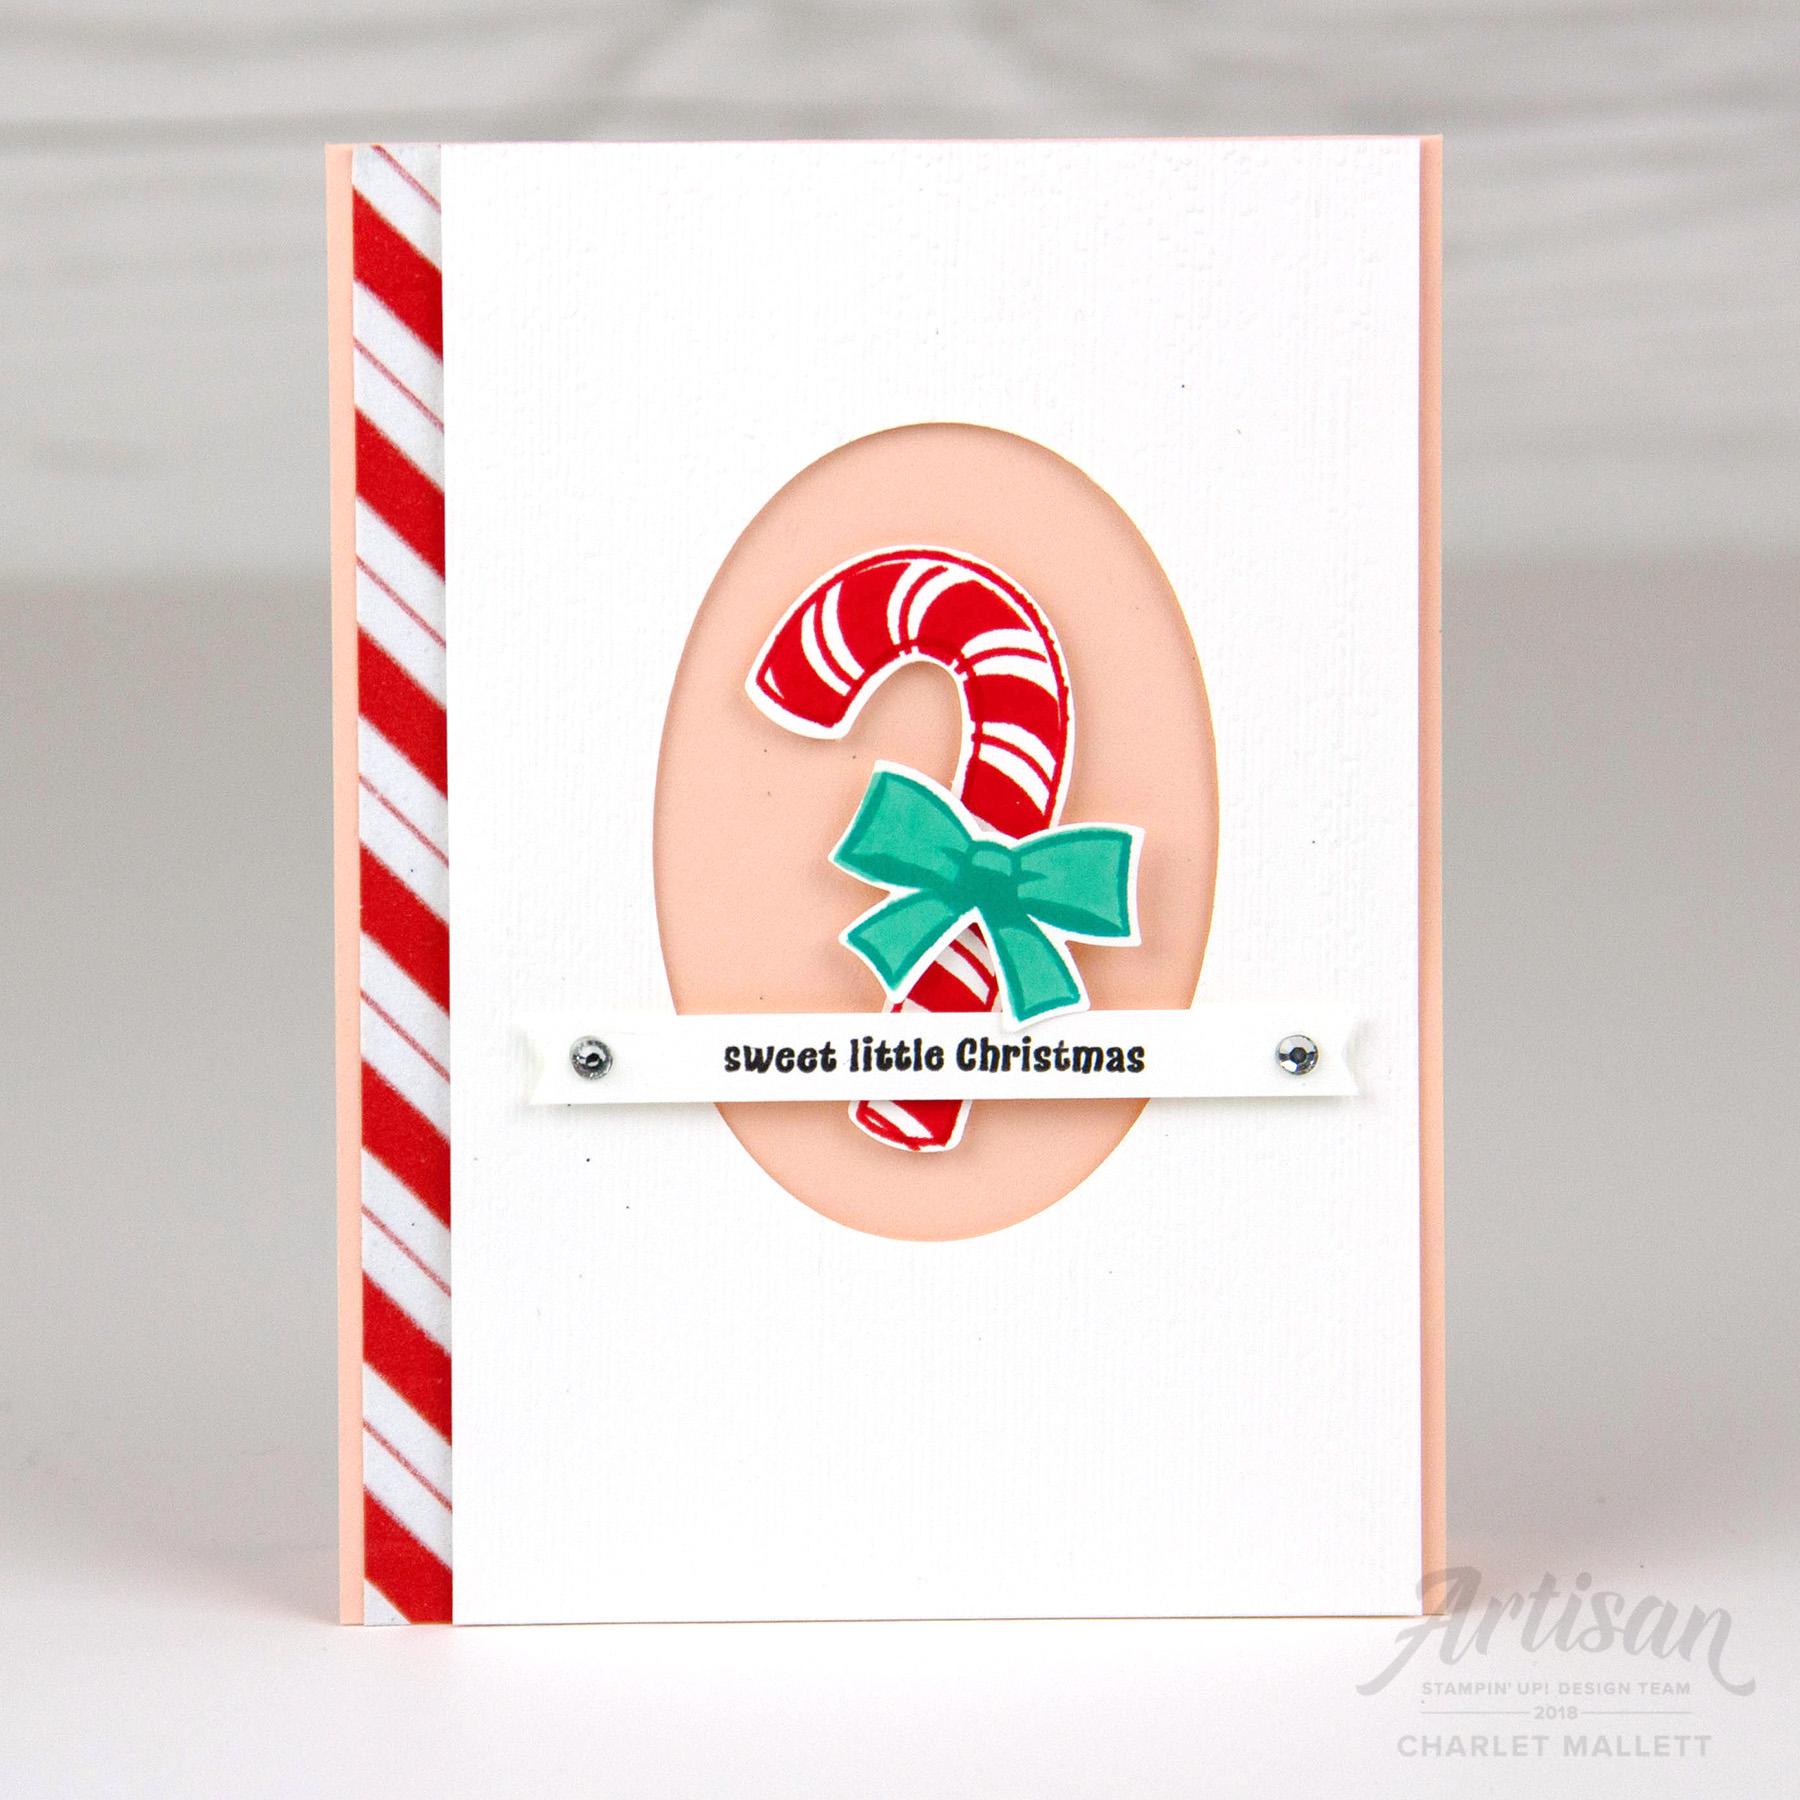 Candy Cane Season (1 of 4).jpg